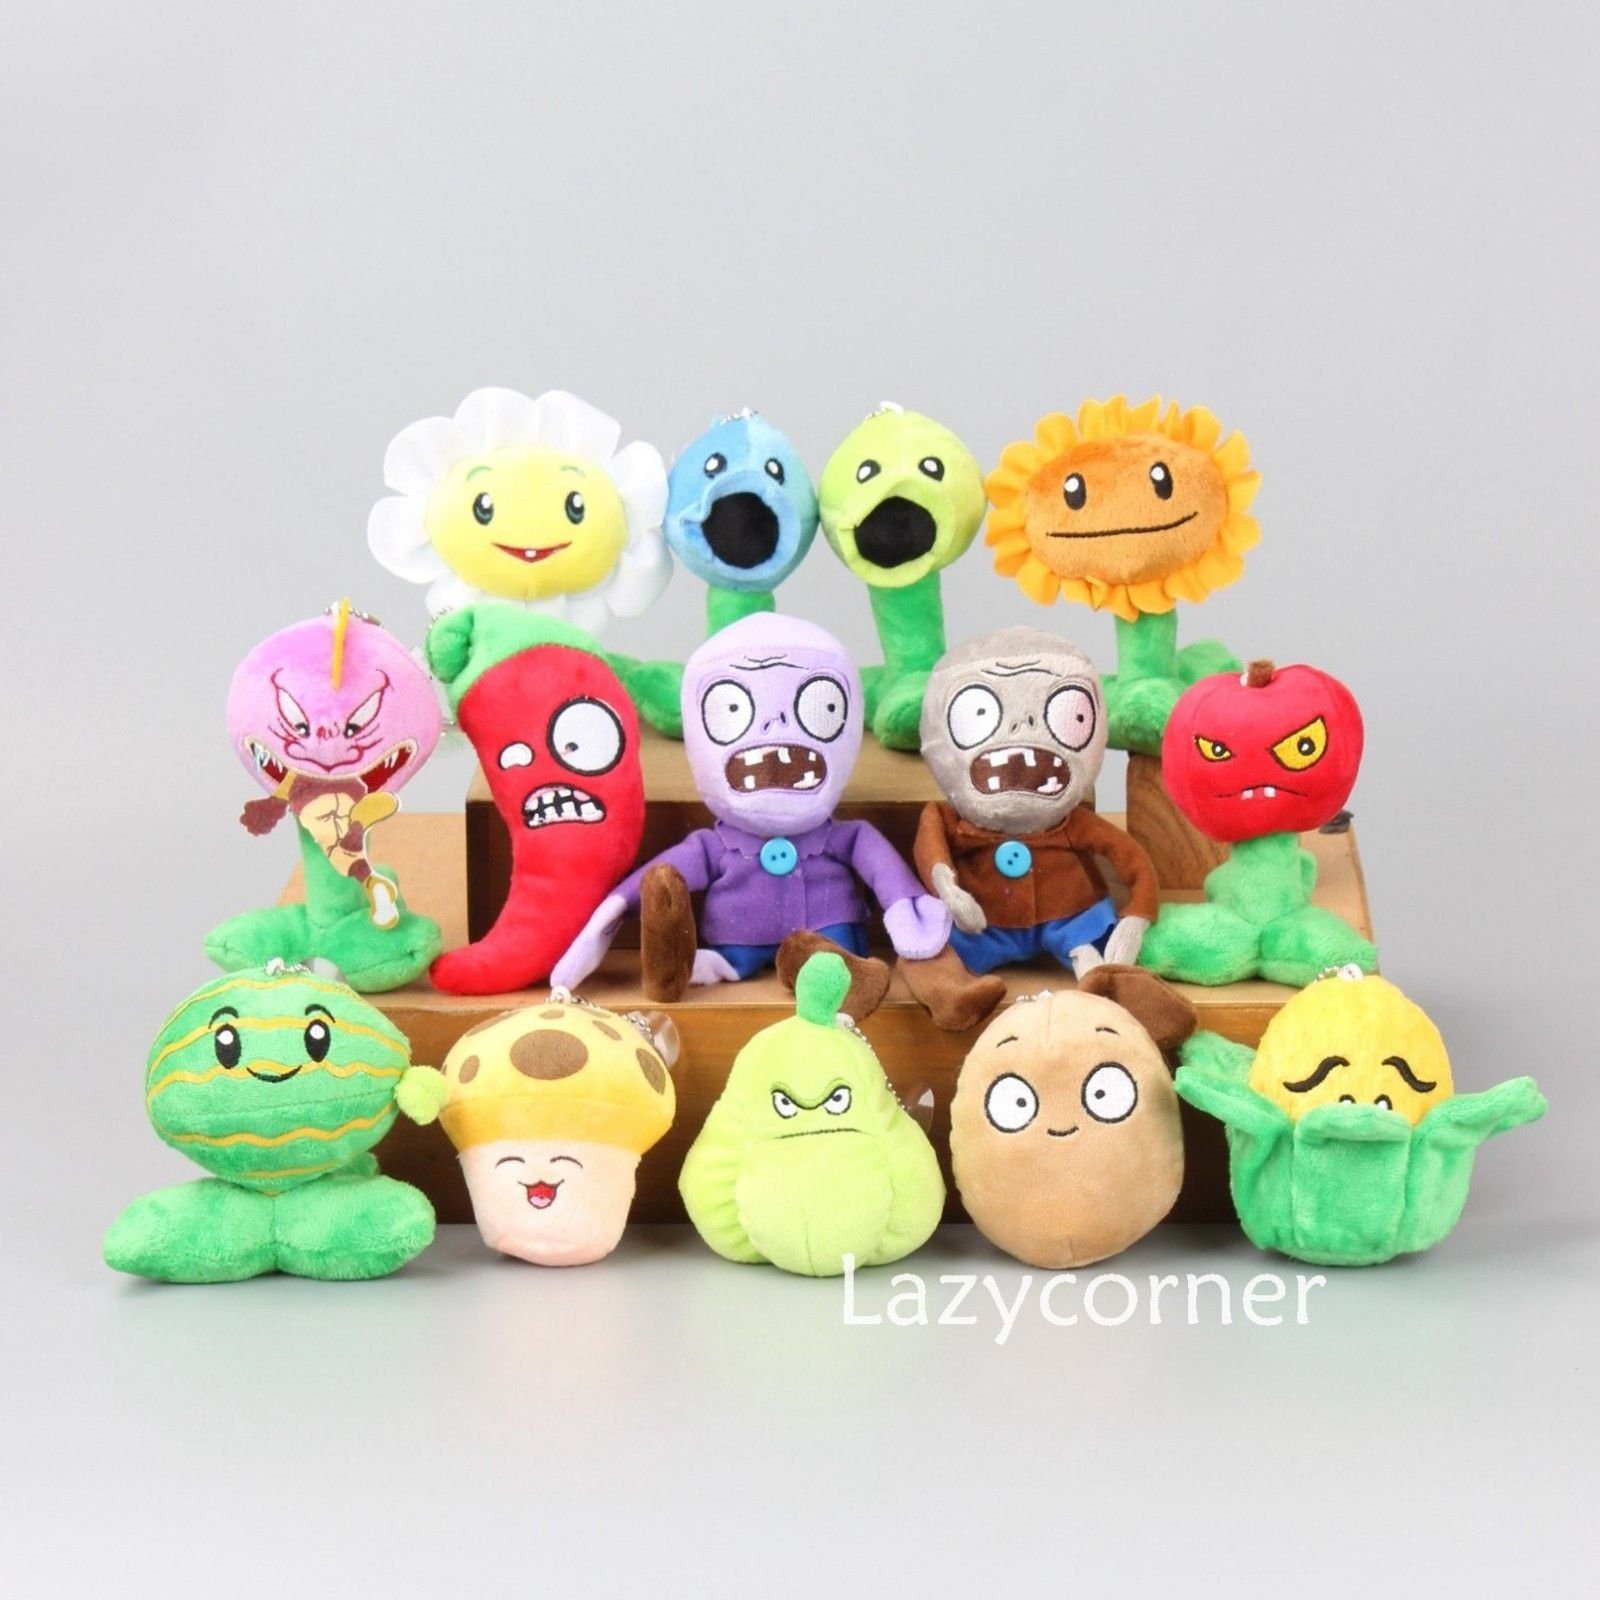 Generic Plants vs Zombies 2 Figures Plush Baby Soft Stuffed Toy Doll 14 pcs Small PVZ 3''-6'' by Generic NovaSaleOU